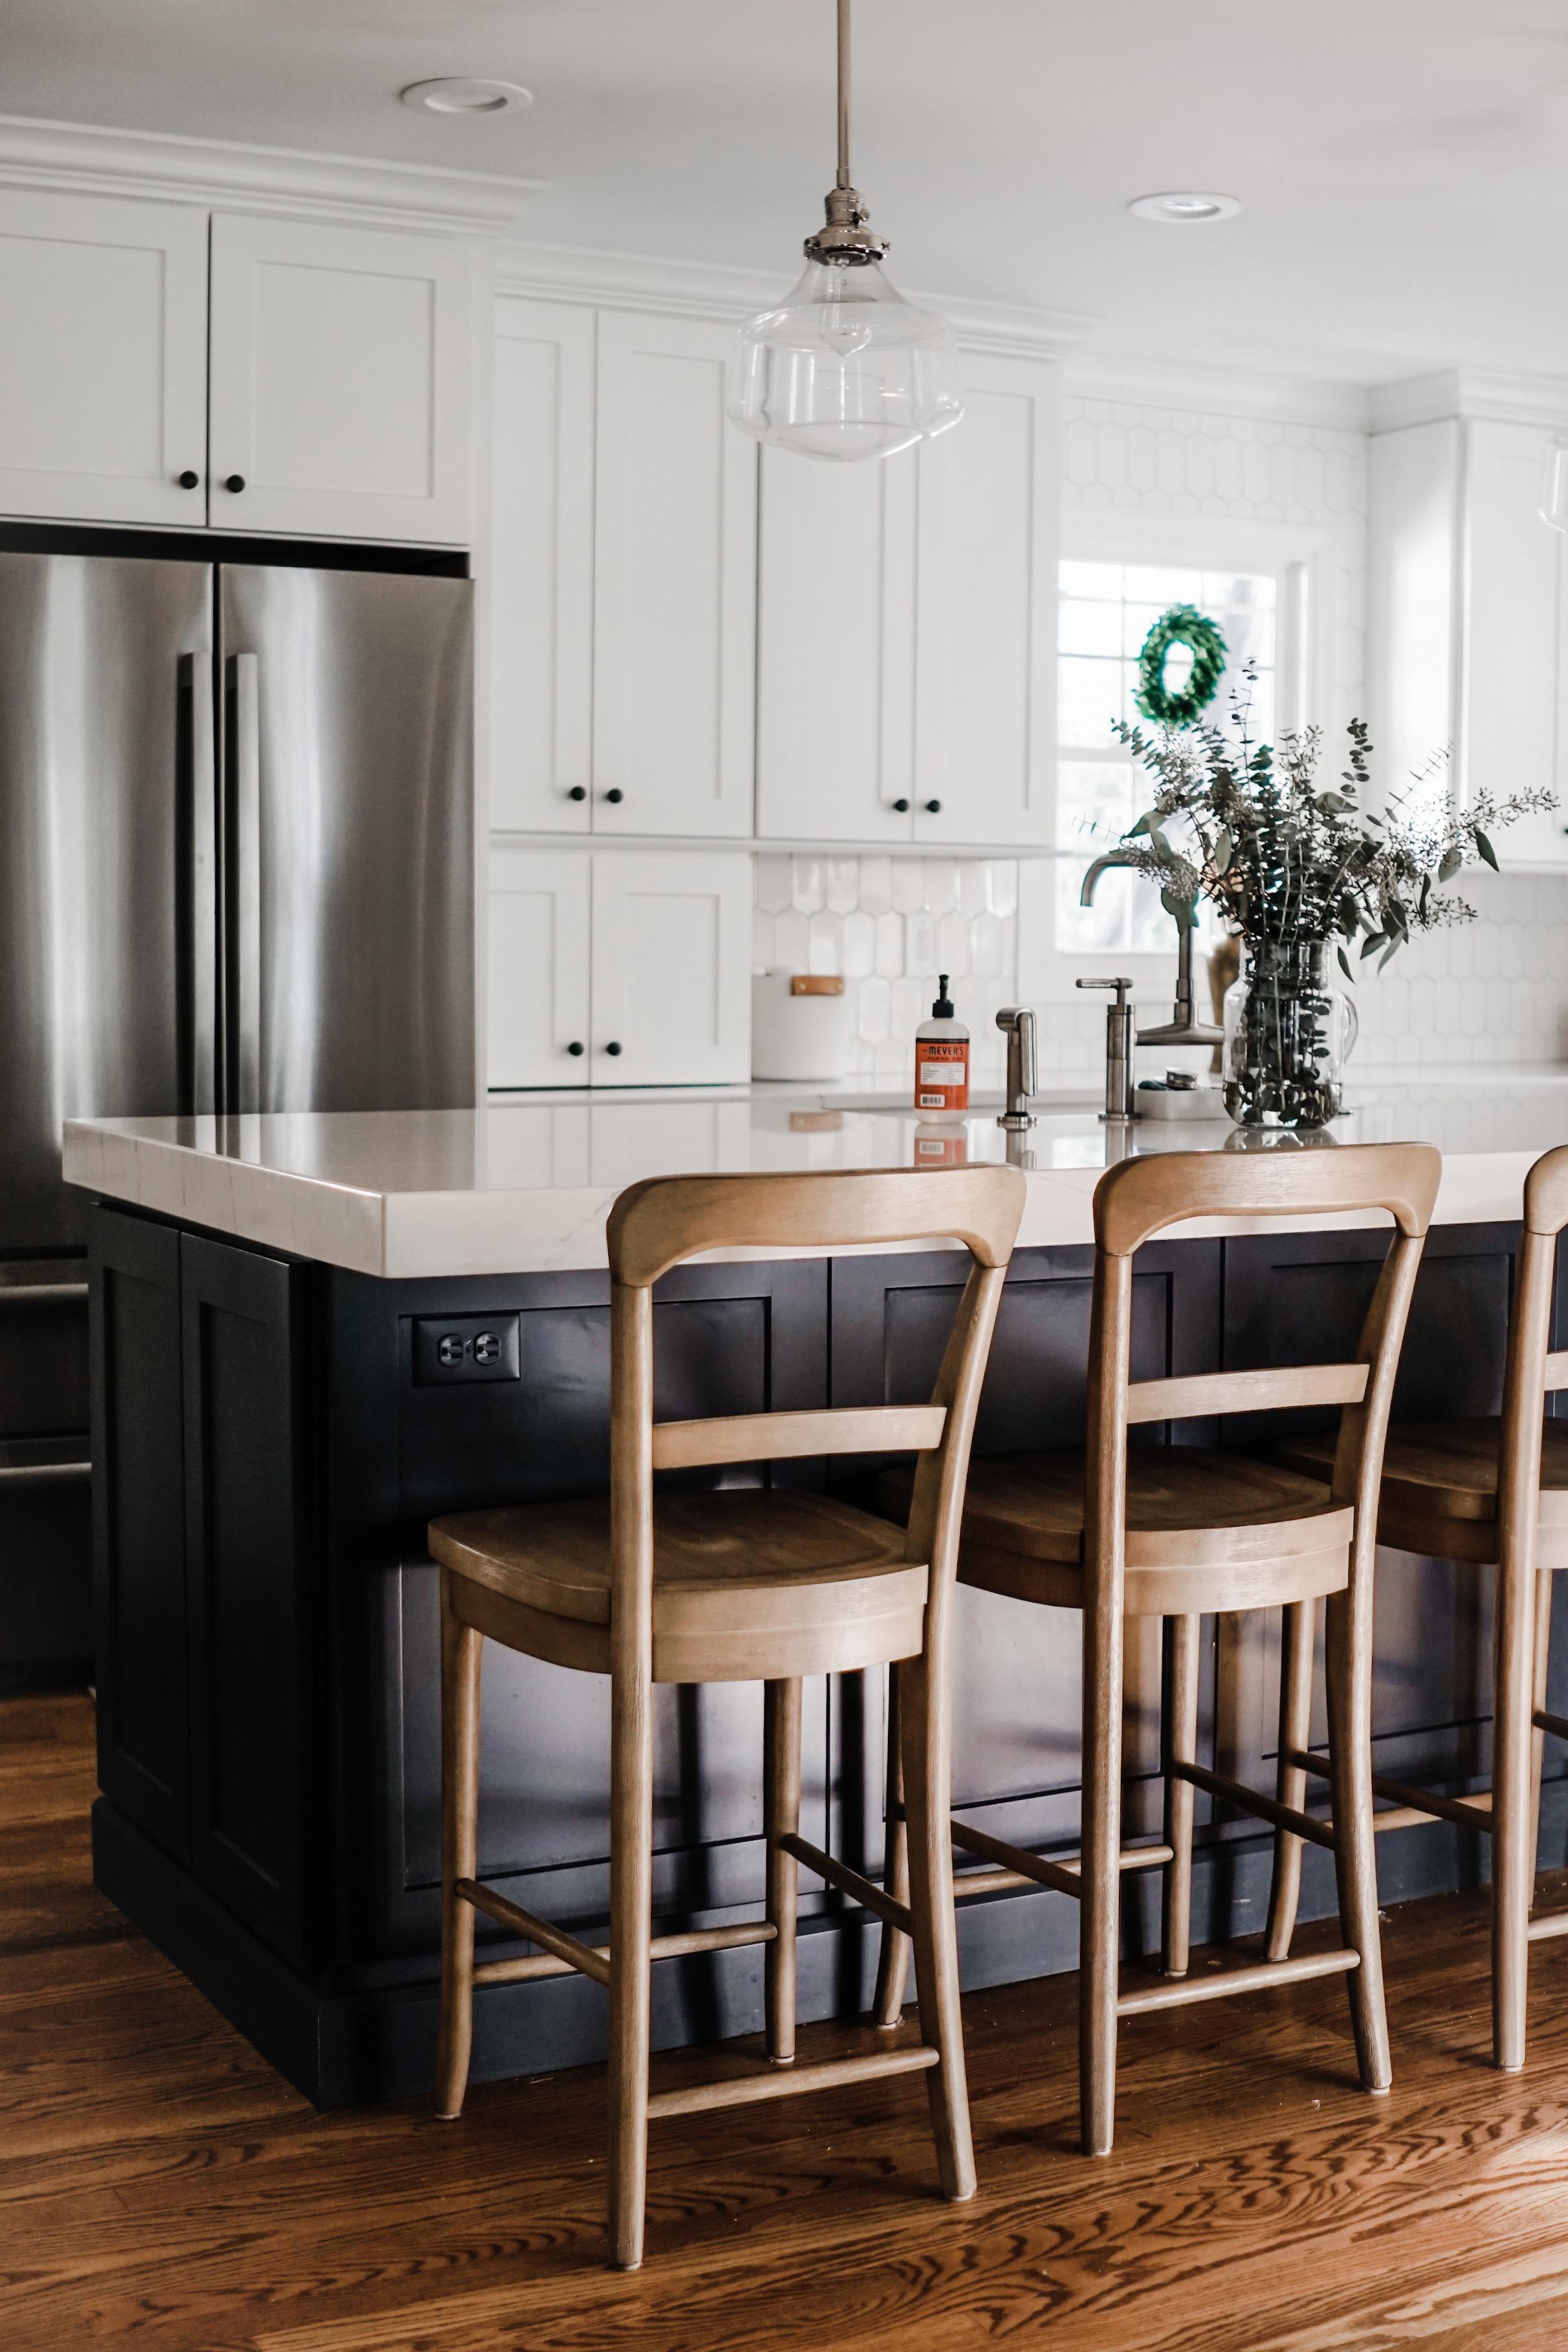 fall decor inspiration  - add mini boxwood wreaths to your windows // fall kitchen decor idea